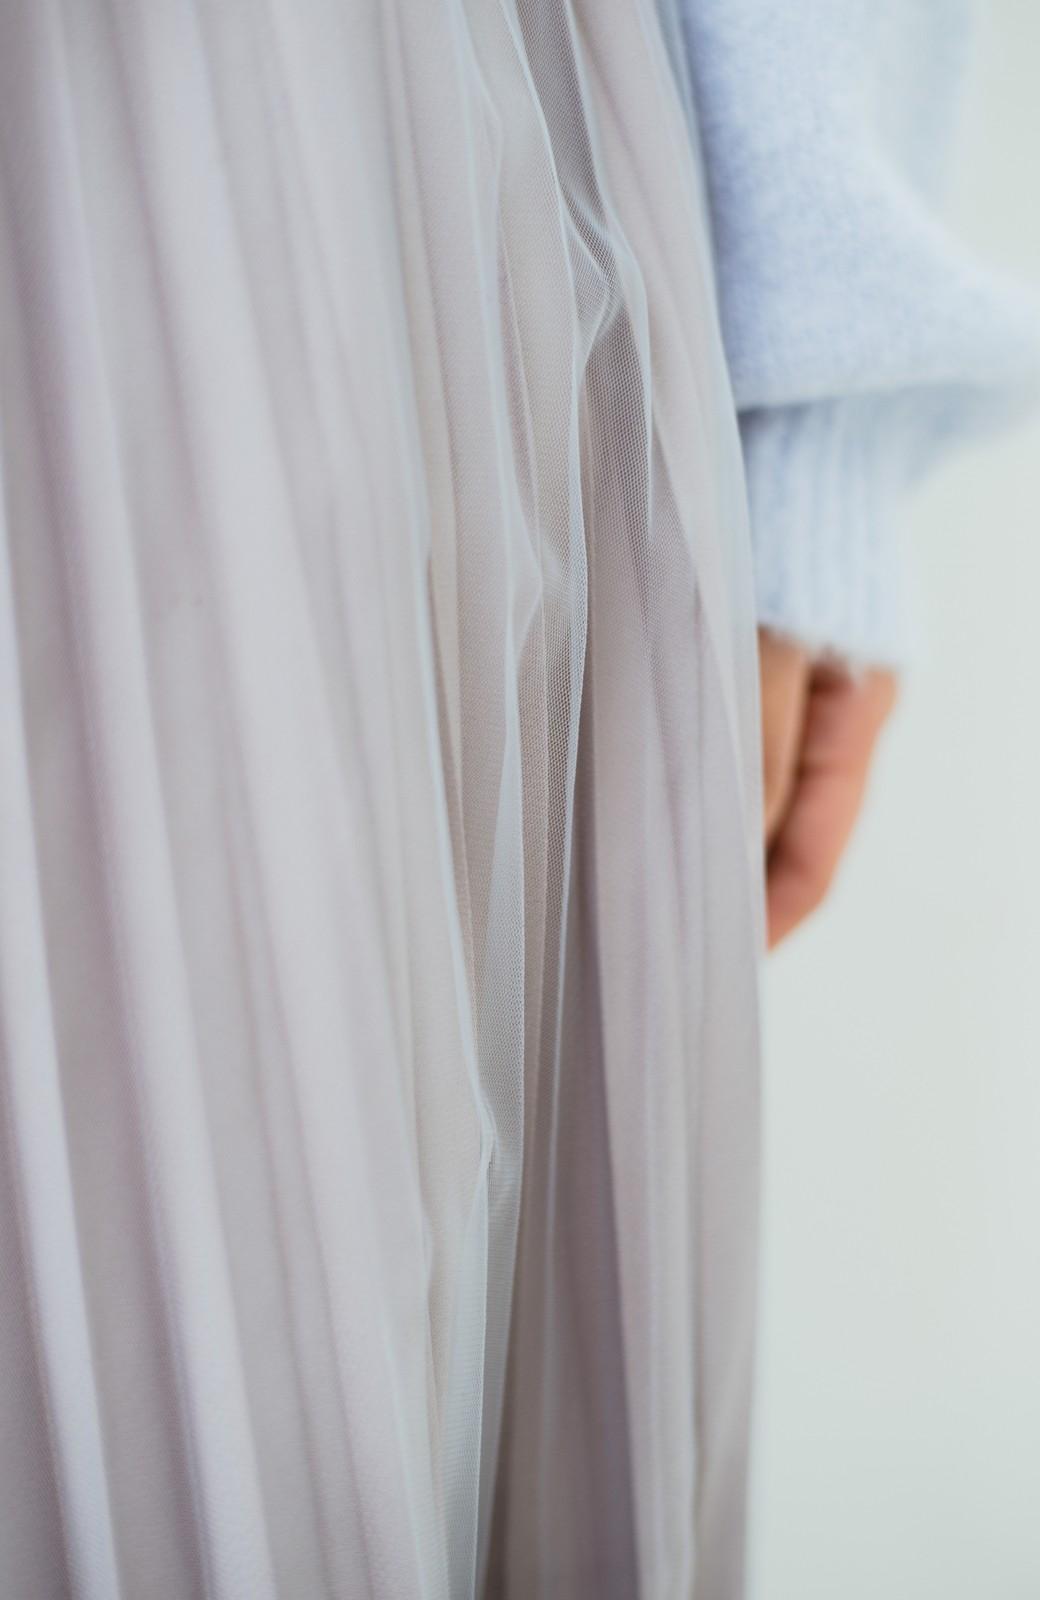 haco! どんな日も華やか気分にしてくれる 二枚仕立てのチュールプリーツスカート <ライトグレー>の商品写真2